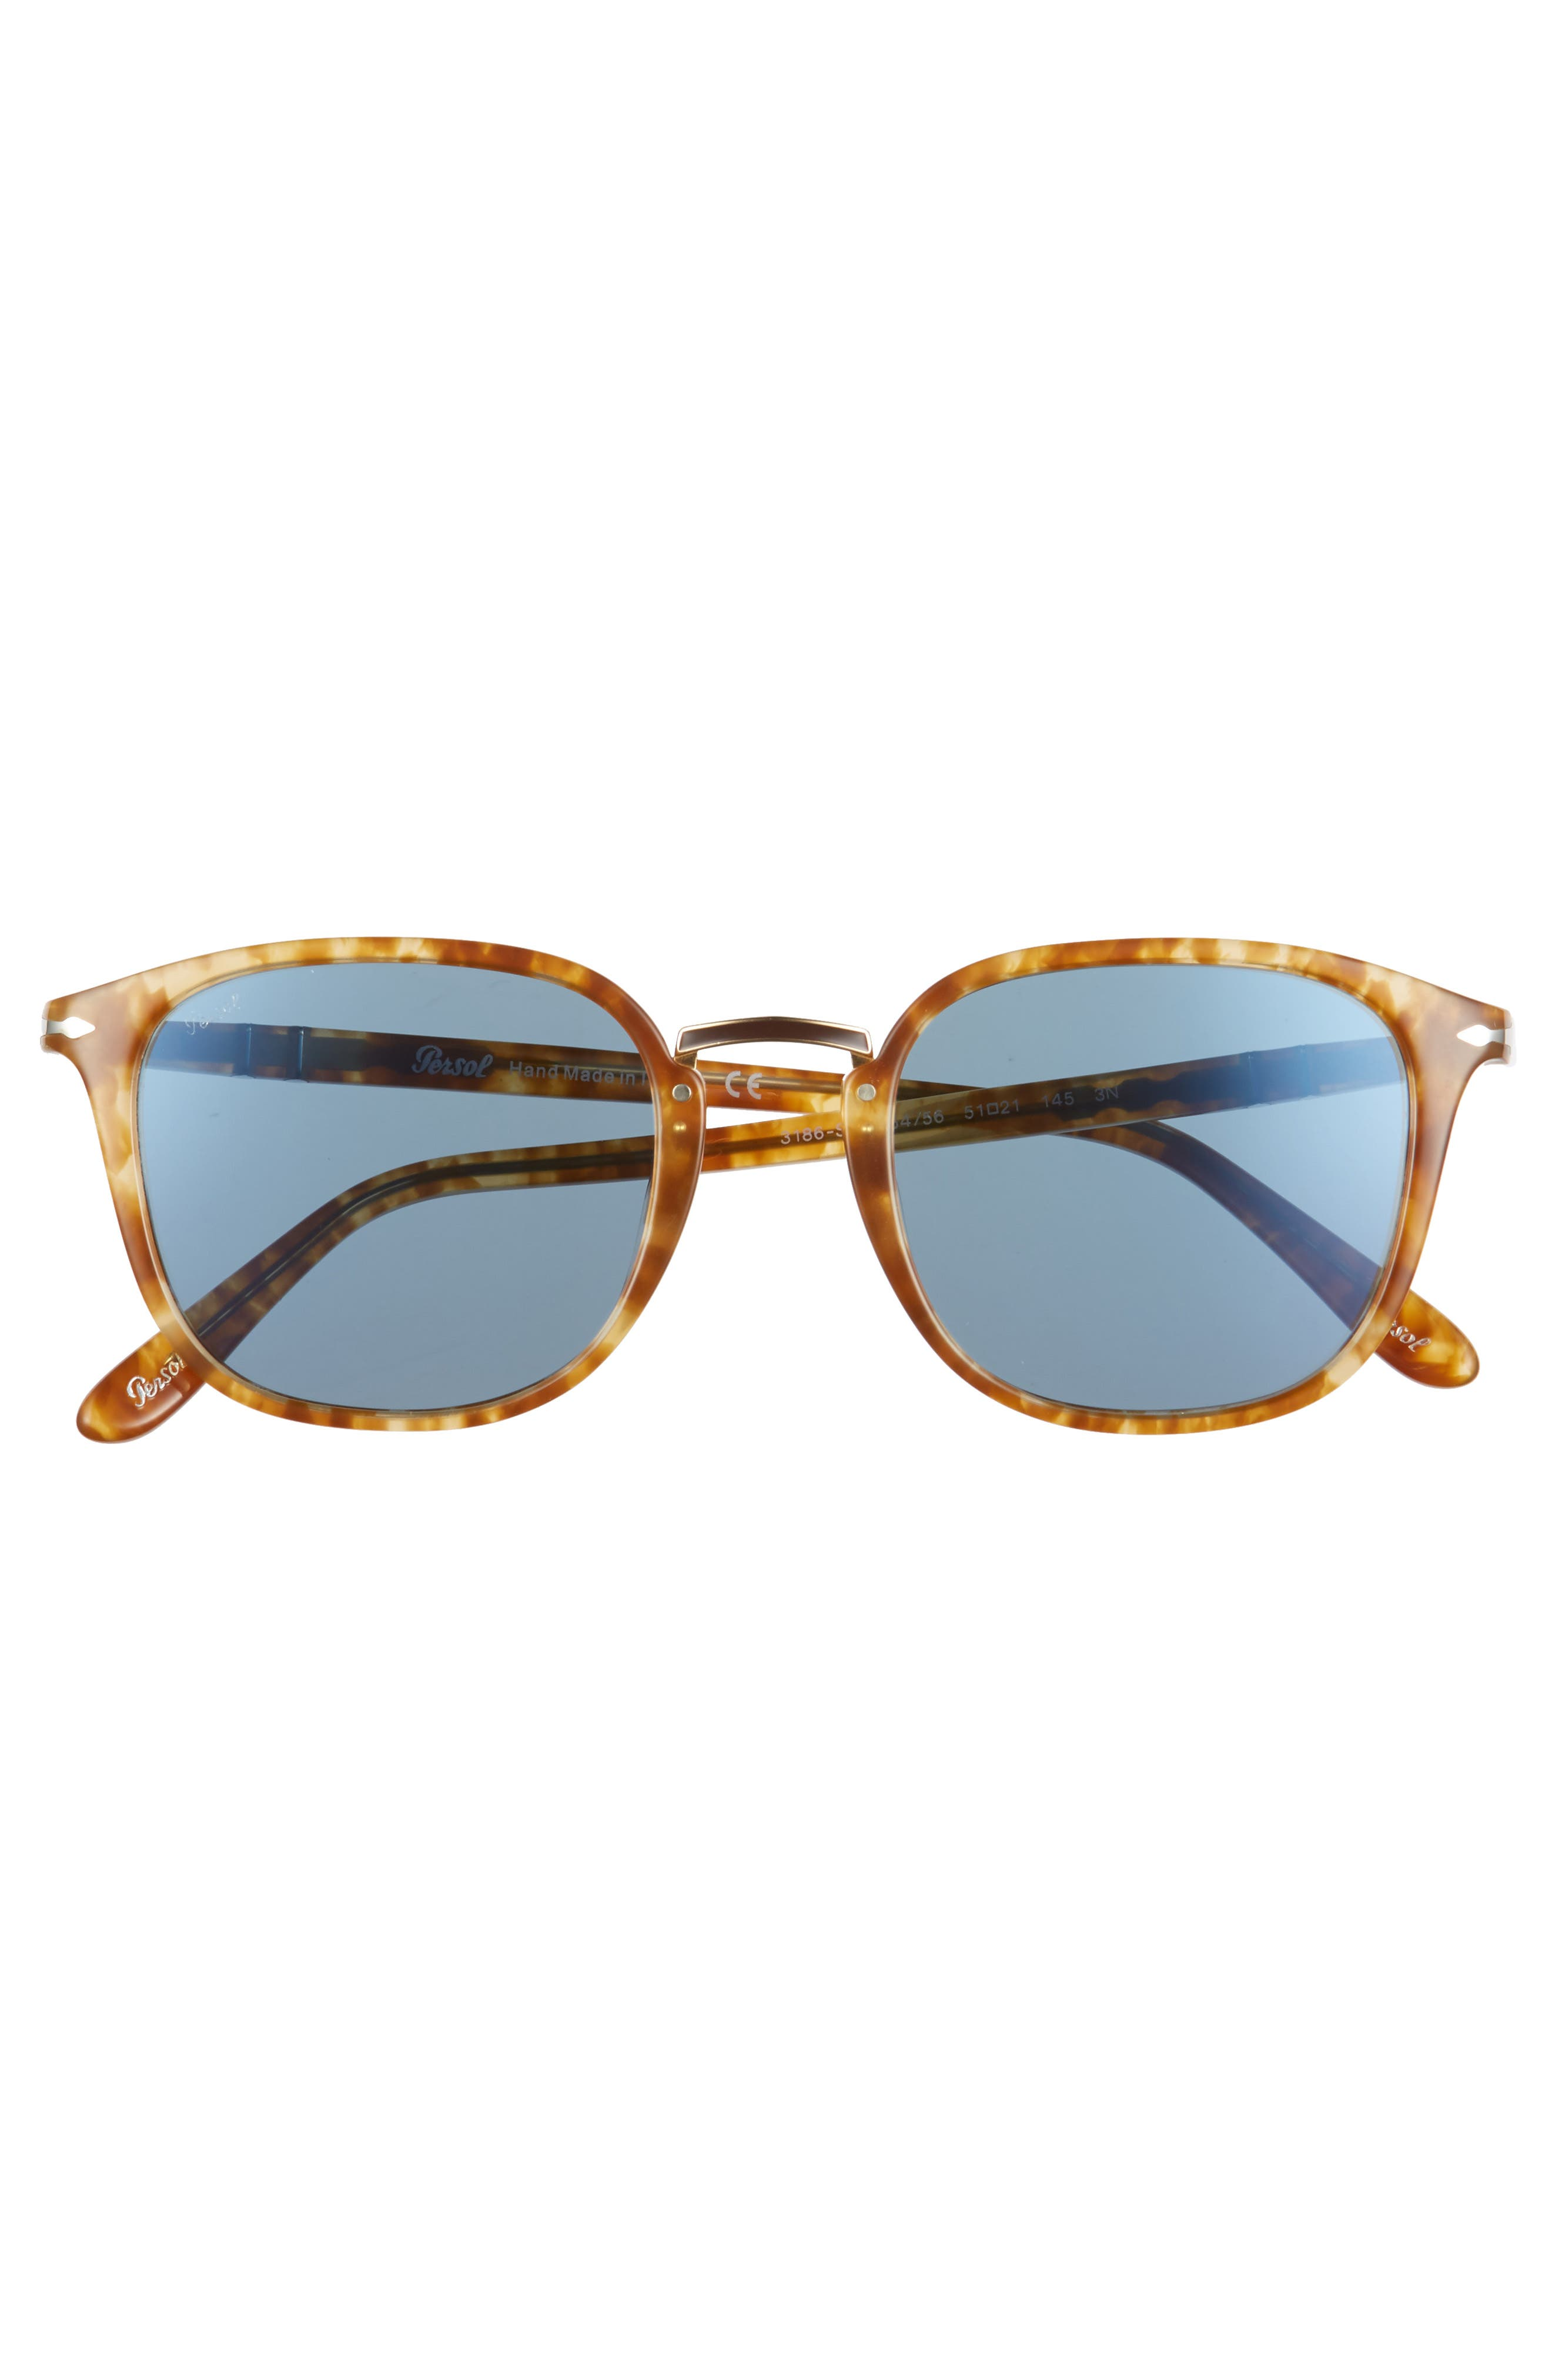 Phantos 51mm Crystal Lens Sunglasses,                             Alternate thumbnail 2, color,                             260